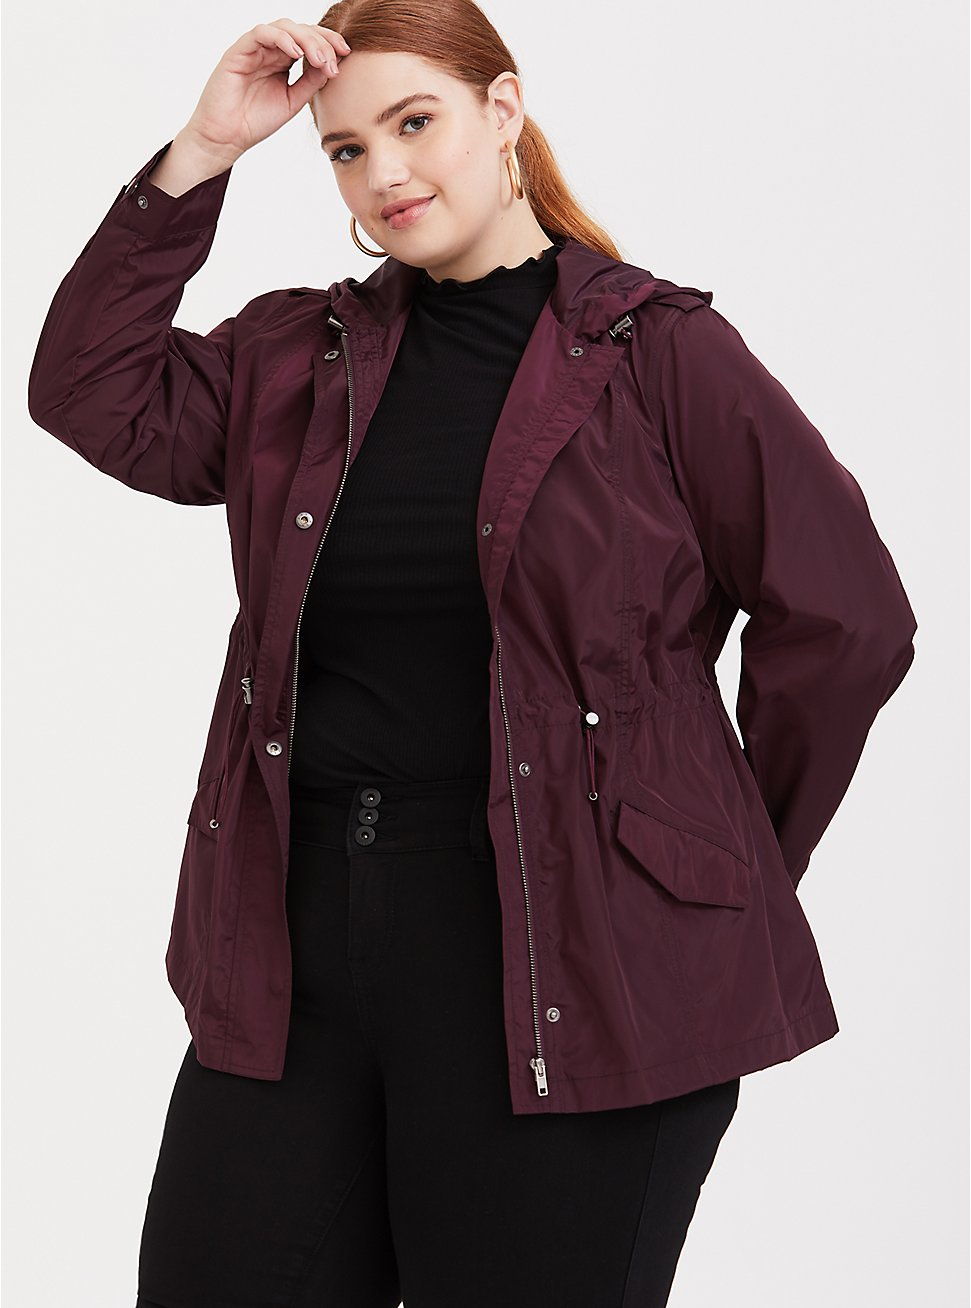 Burgundy Purple Nylon Hooded Rain Jacket, , hi-res